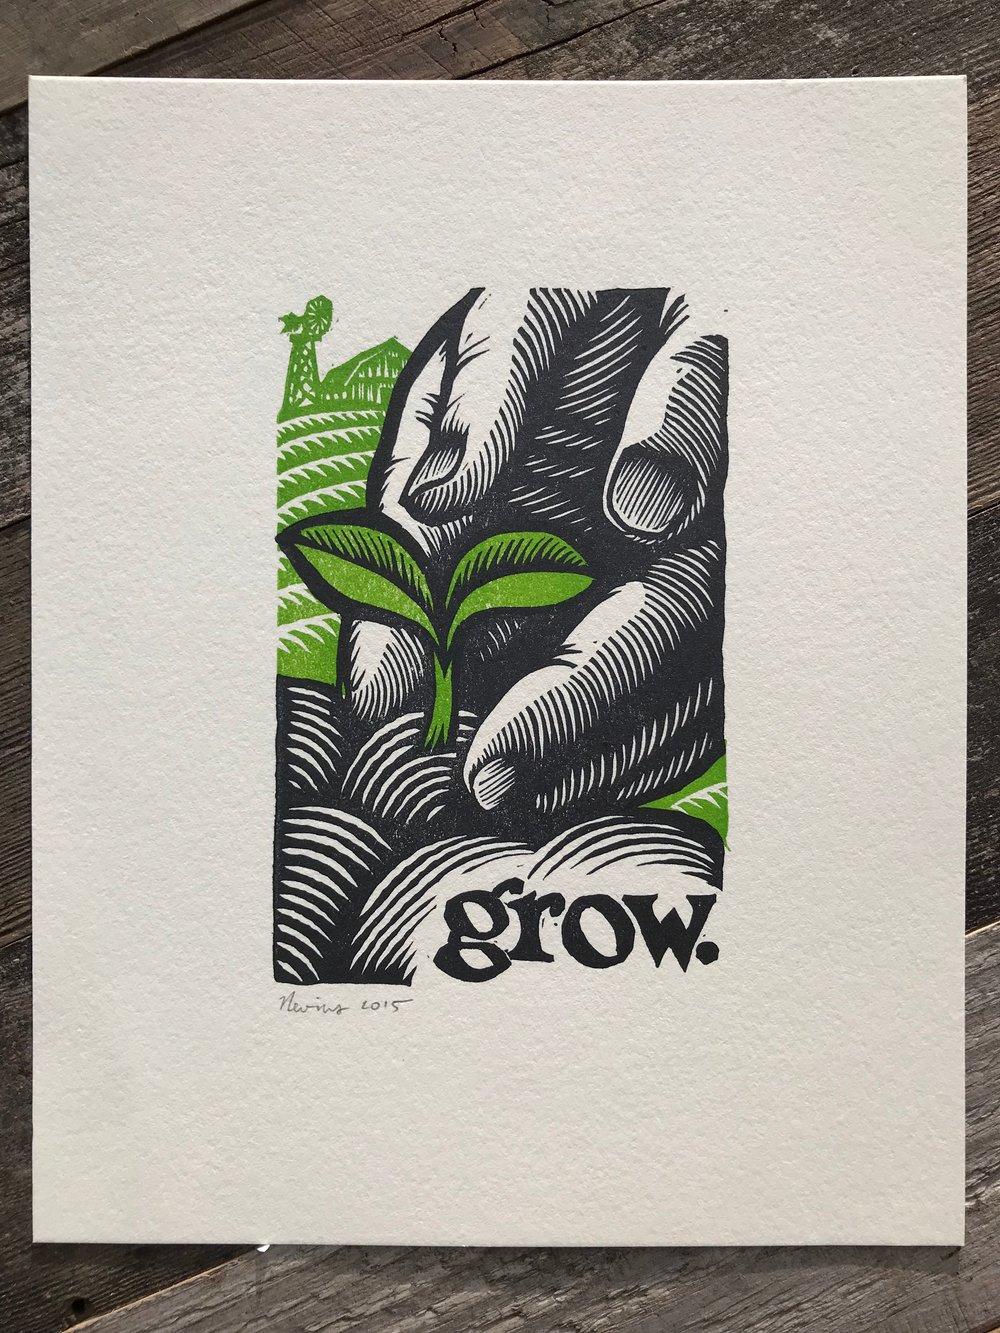 "grow. 8""x10"" HAND-PRINTED ORIGINAL BLOCK PRINT"